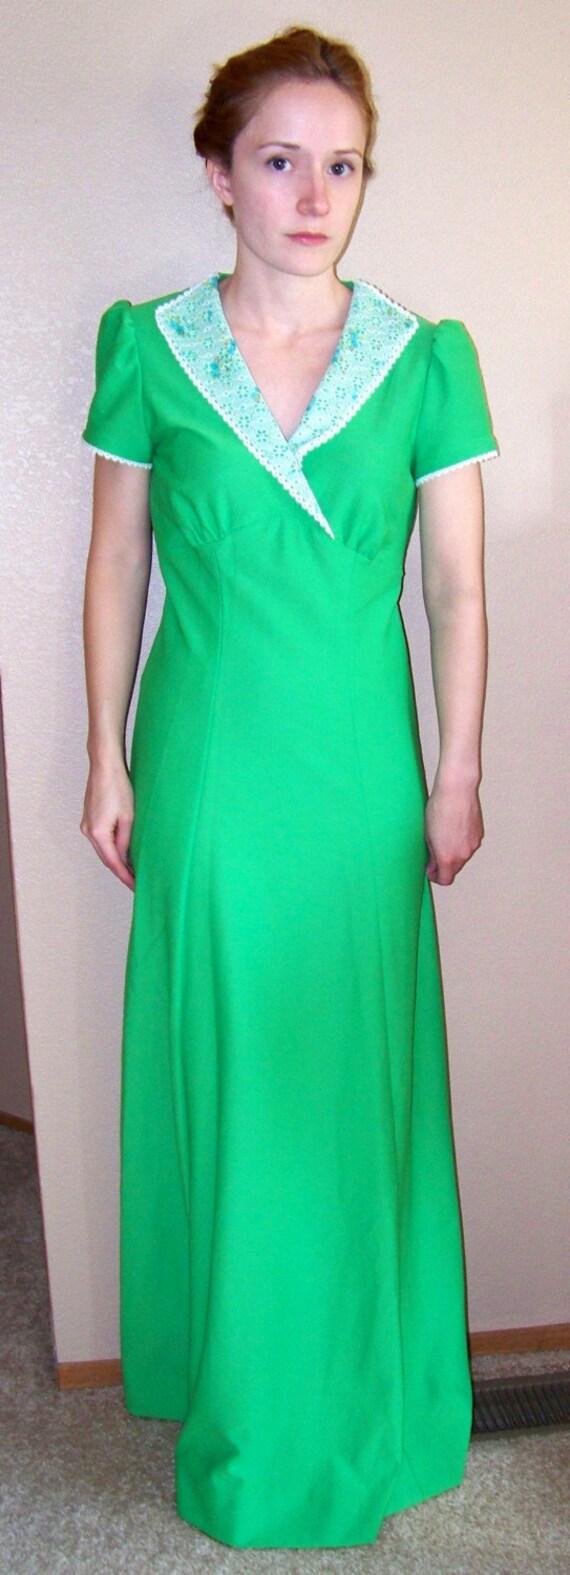 Green 70s dress dolly retro apple maxi eyelet floral collar s for Apple green dress shirt